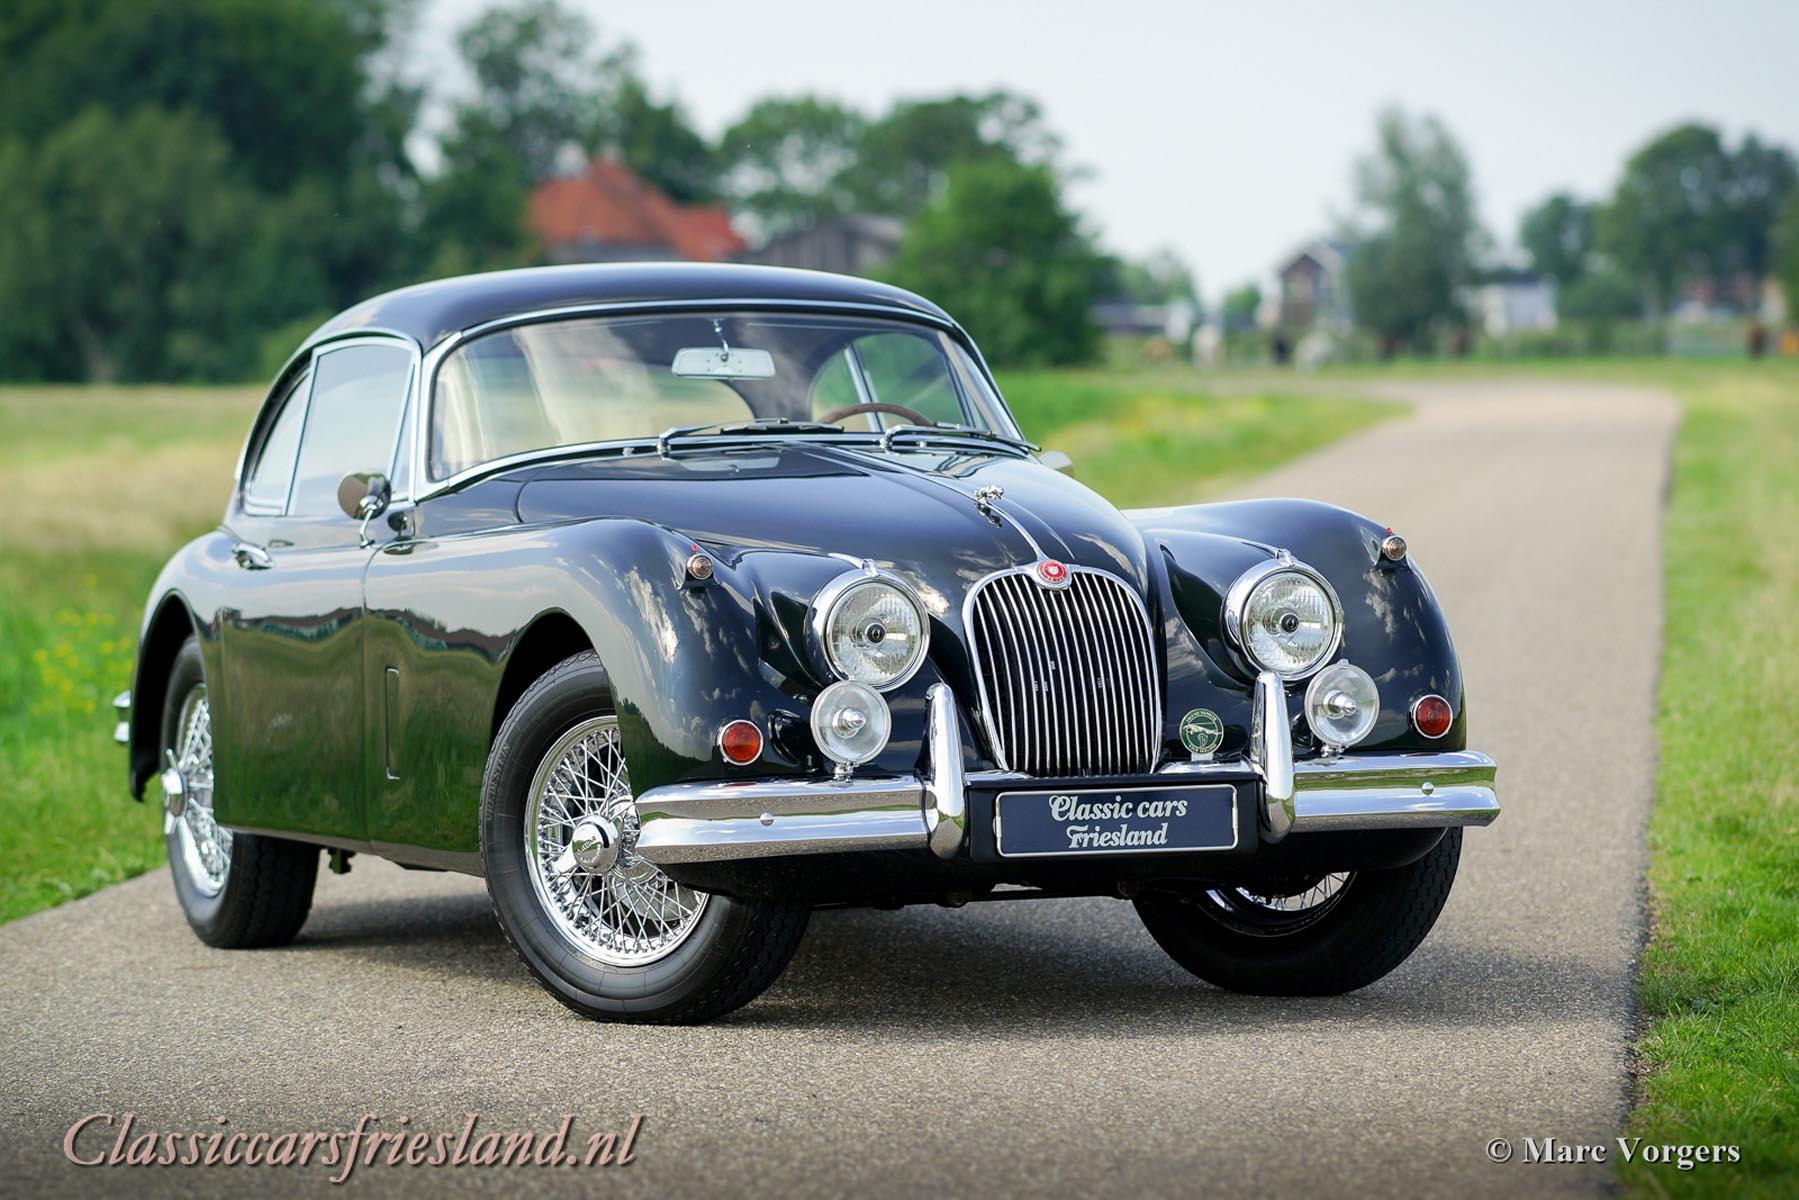 Collection Classic Cars Friesland Automotivepictures 4163321994sl2alternatorwirediagram1jpg Jaguar Xk 150 Coupe 38 1960